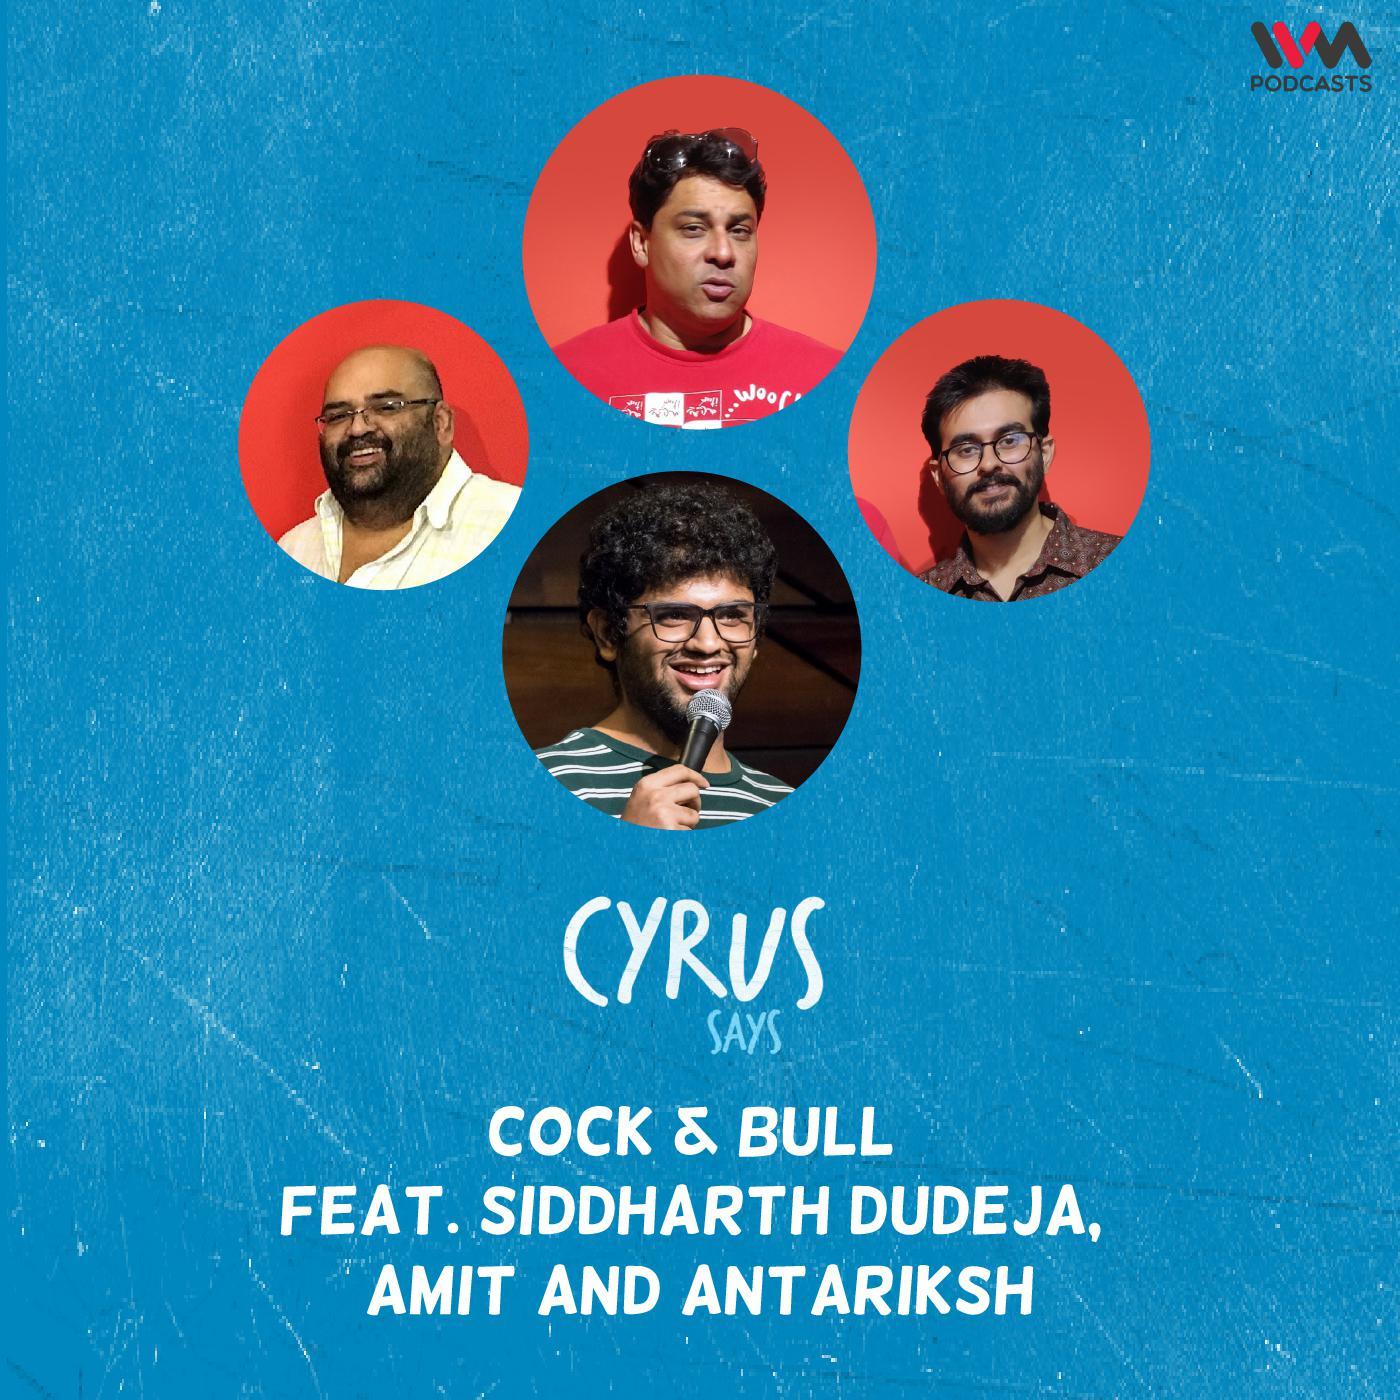 Ep. 683: Cock & Bull feat. Siddharth Dudeja, Amit and Antariksh